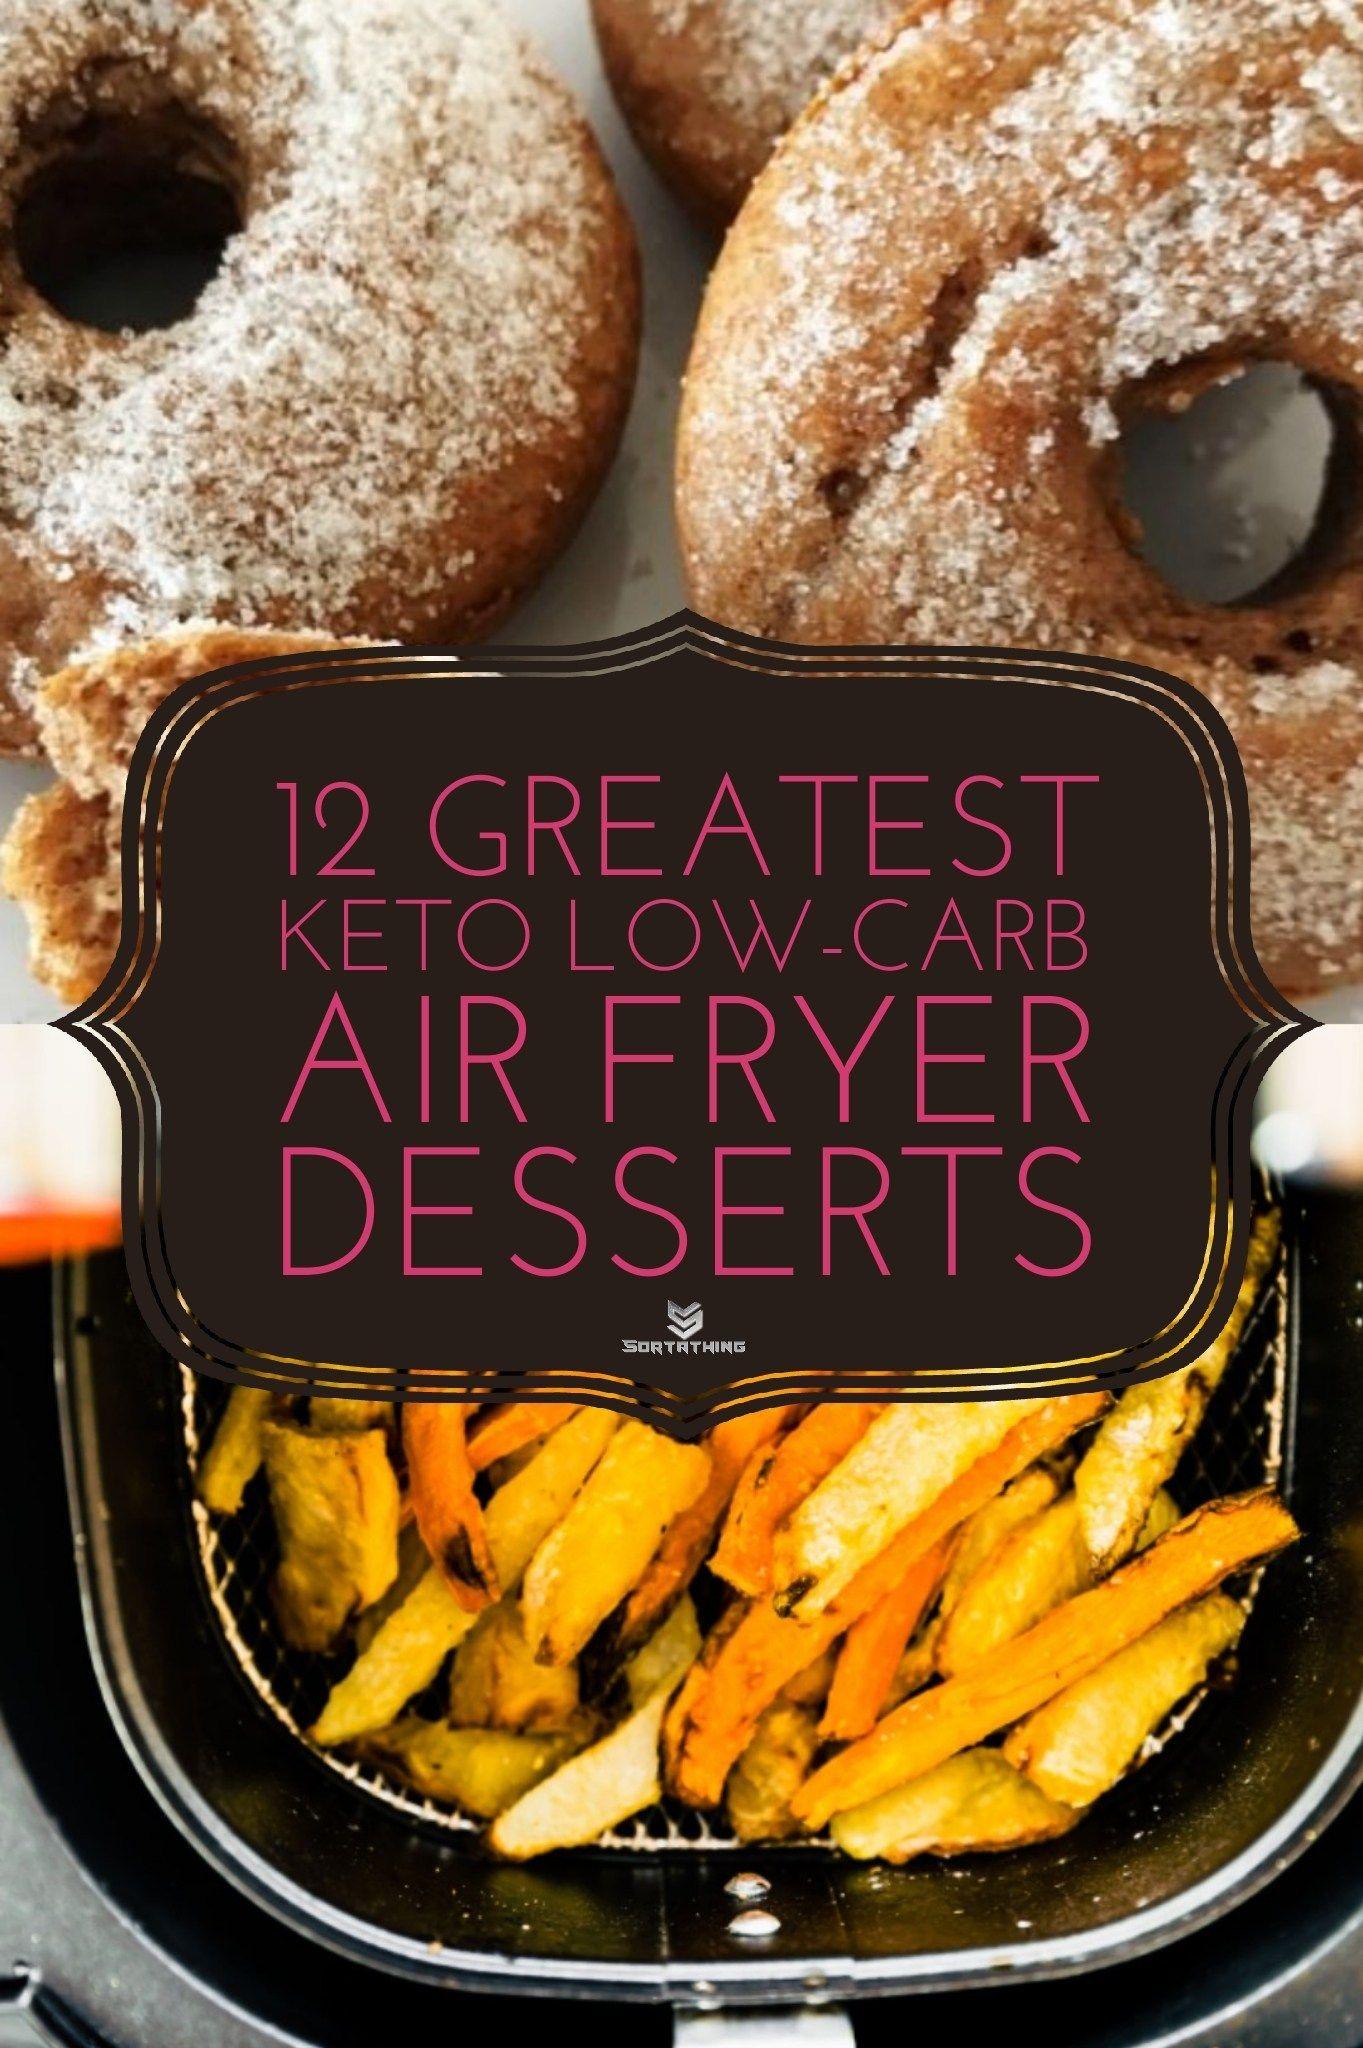 12 Greatest Keto LowCarb Air Fryer Dessert Recipes in